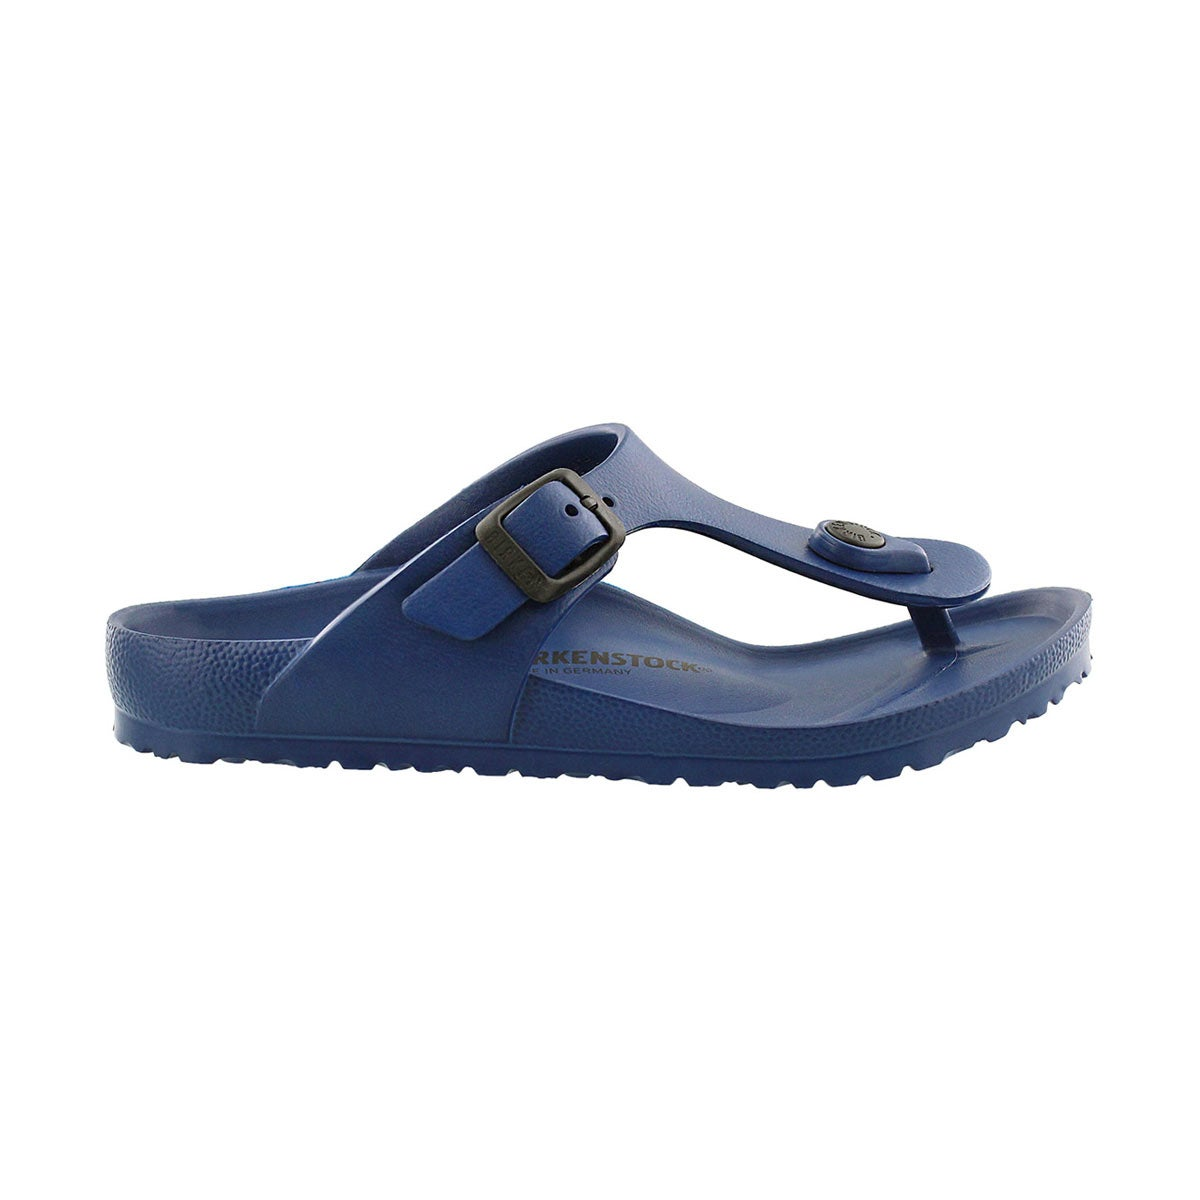 Sandale tong GIZEH EVA, marine, fille